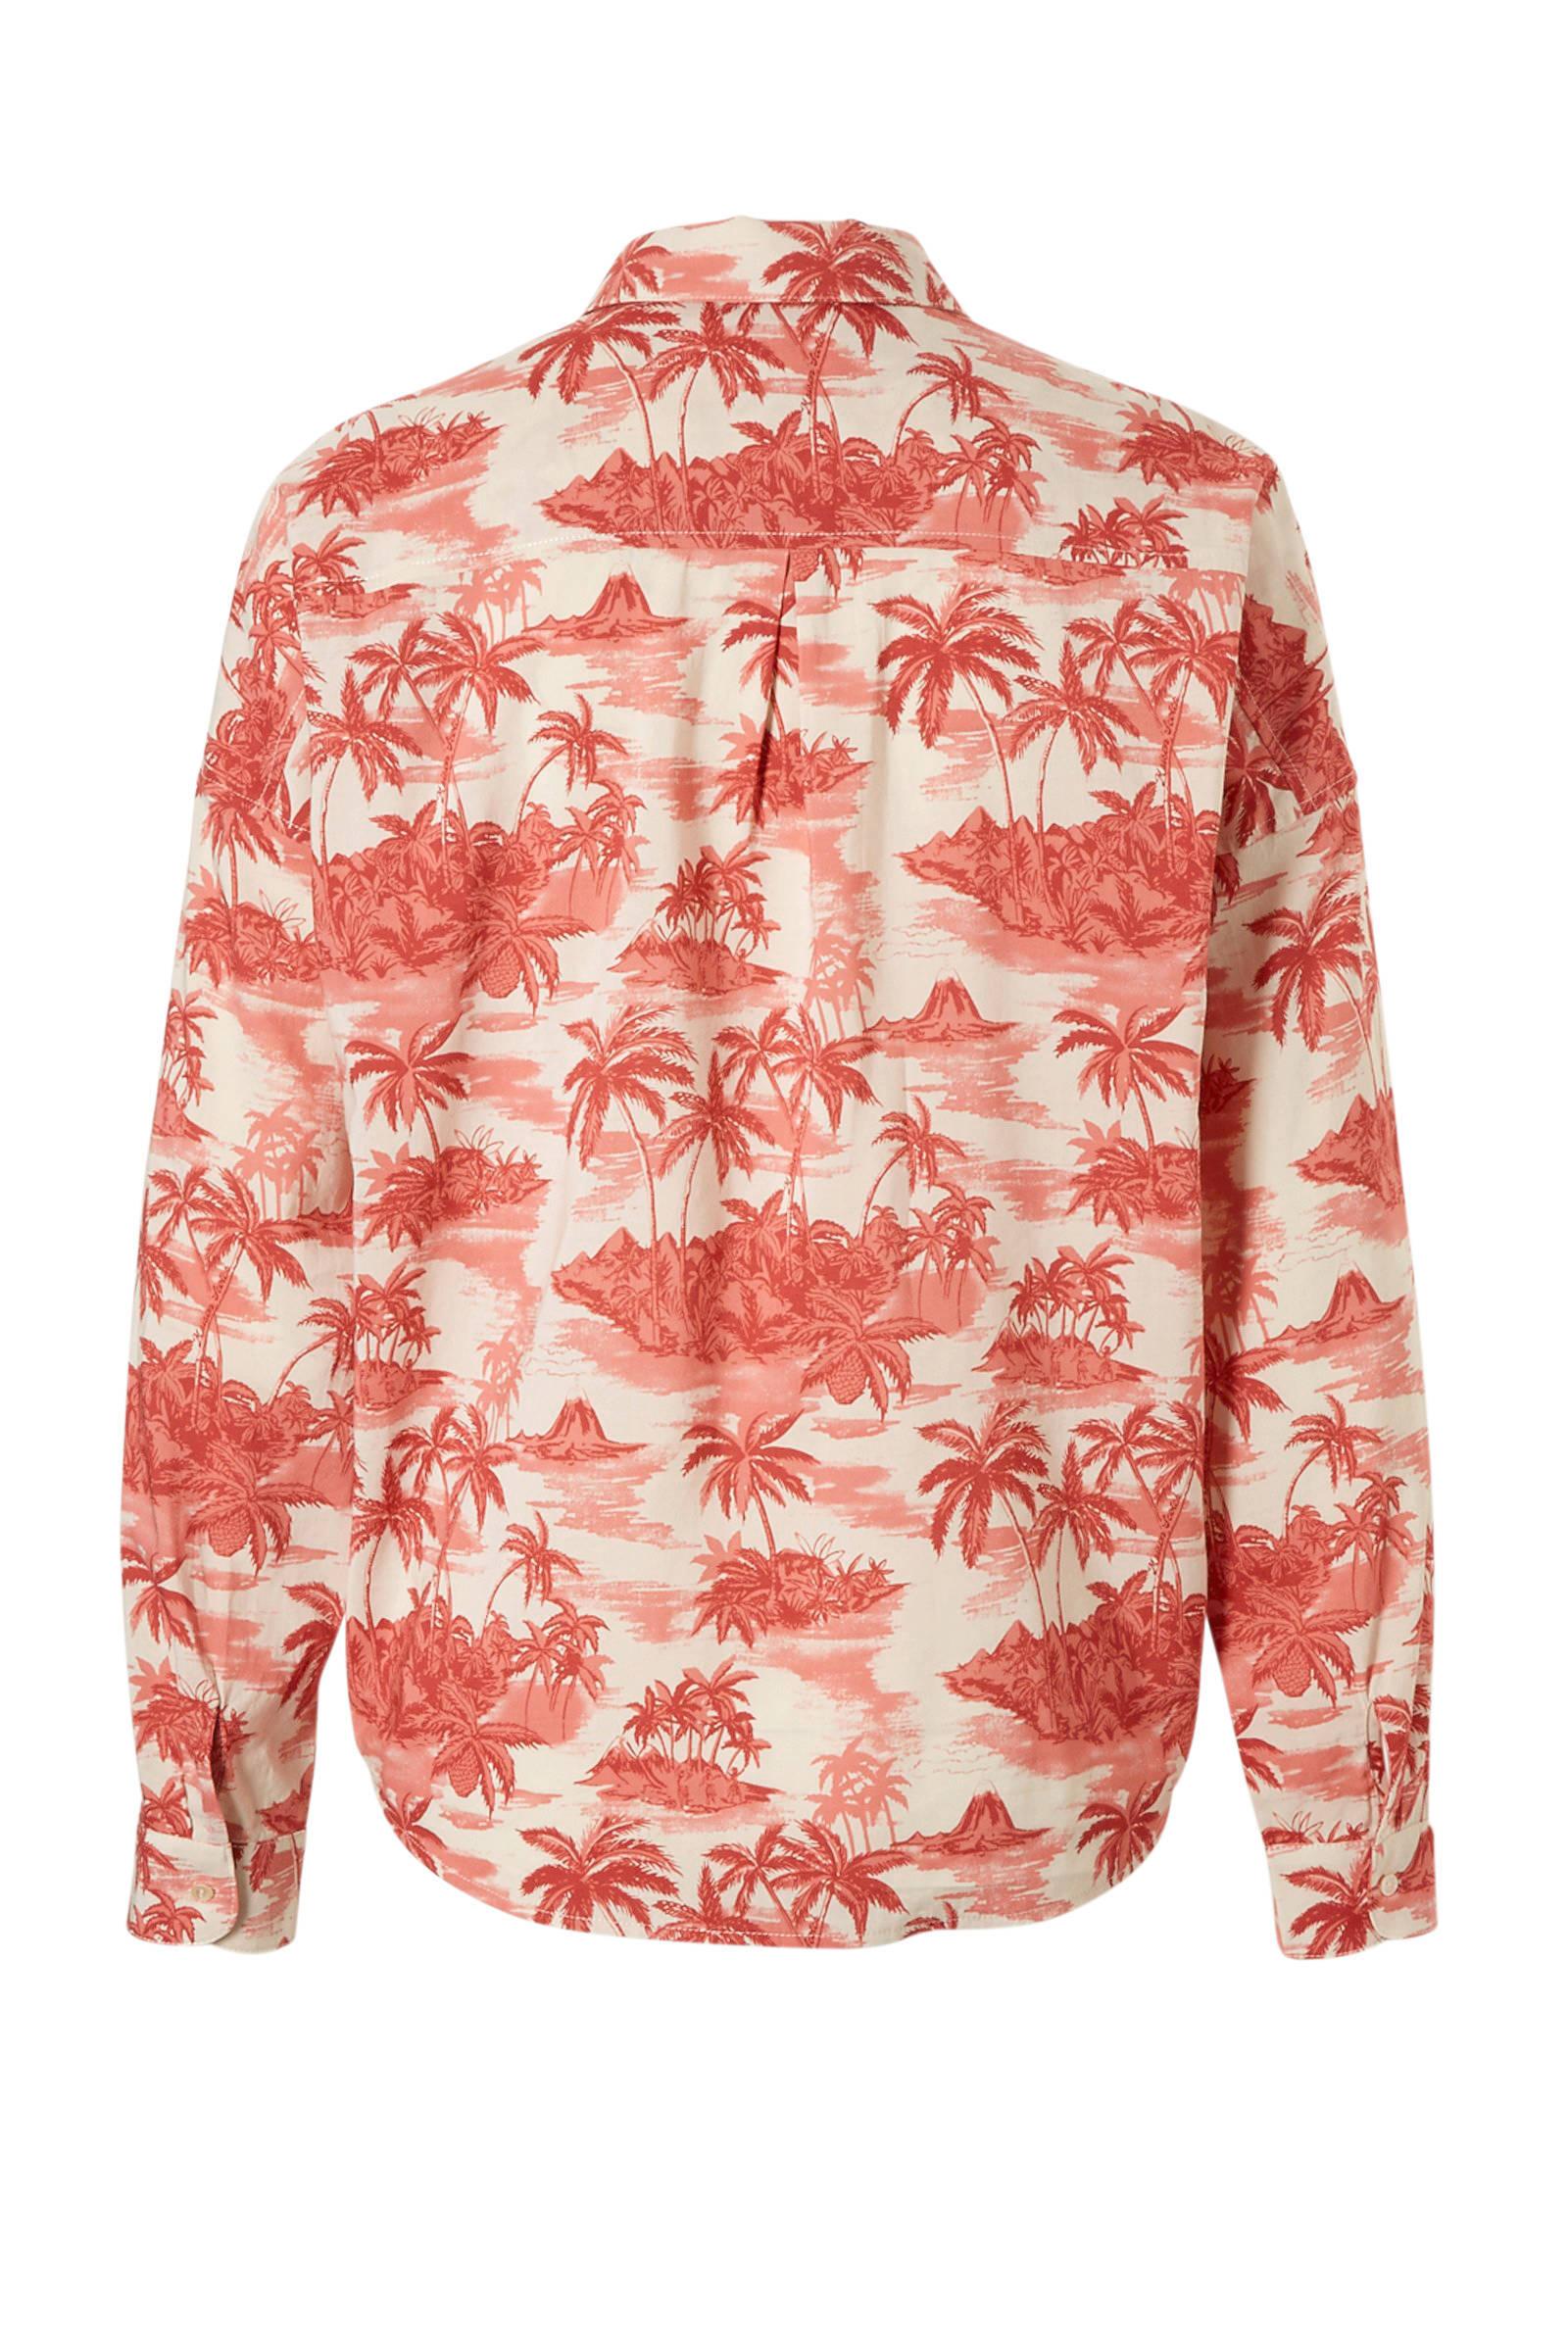 blouse all Soda print Scotch over met P5qw4WZZvC